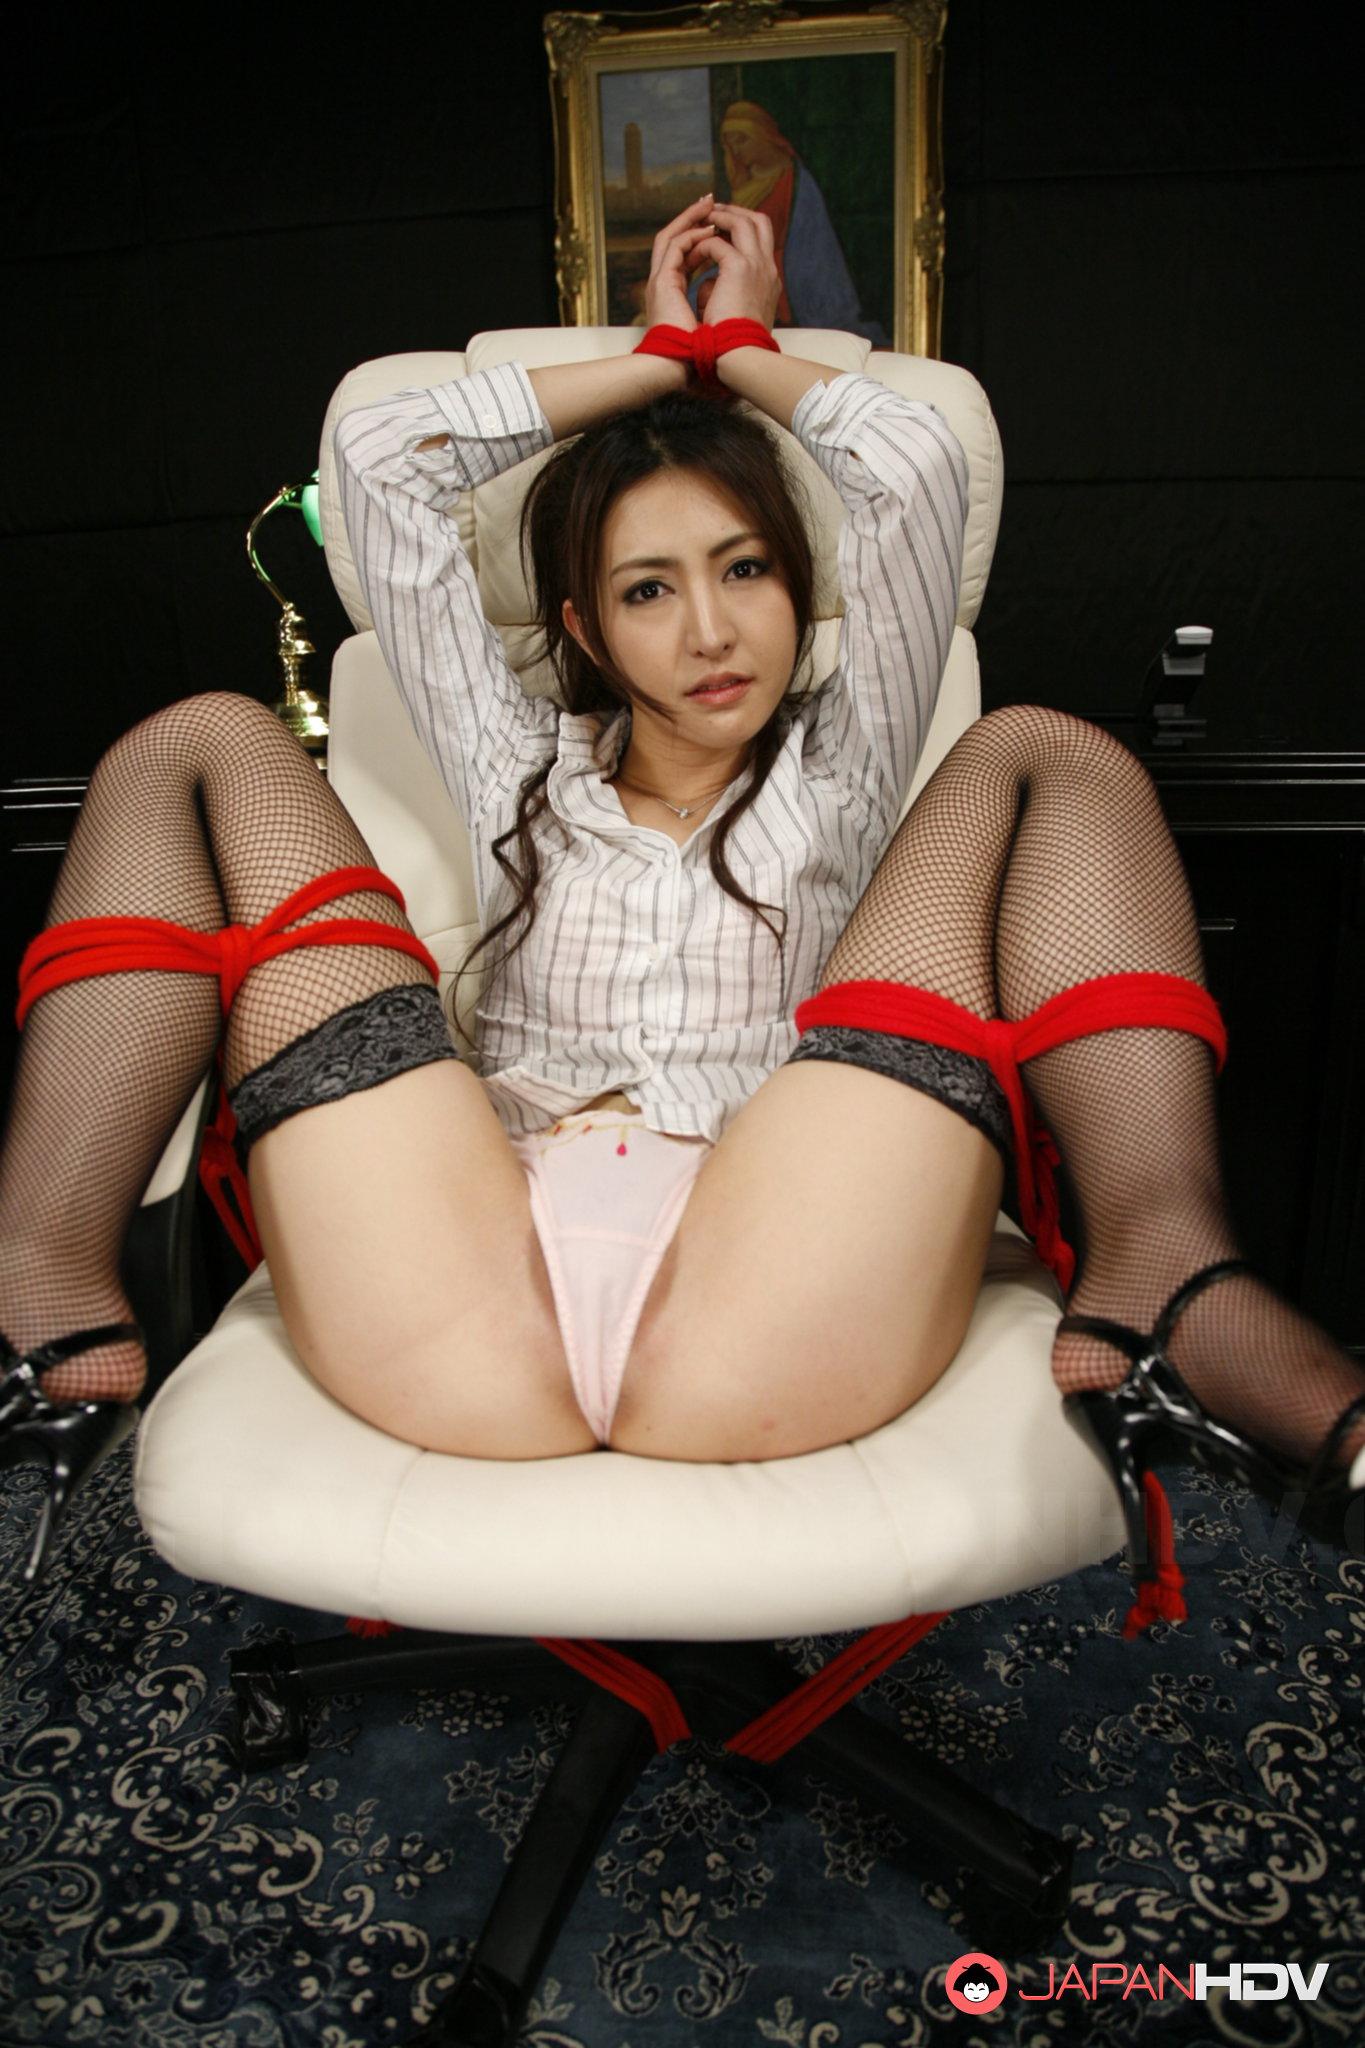 Yayoi yoshino caught in bus gangbang part 2 uncensored jav 3